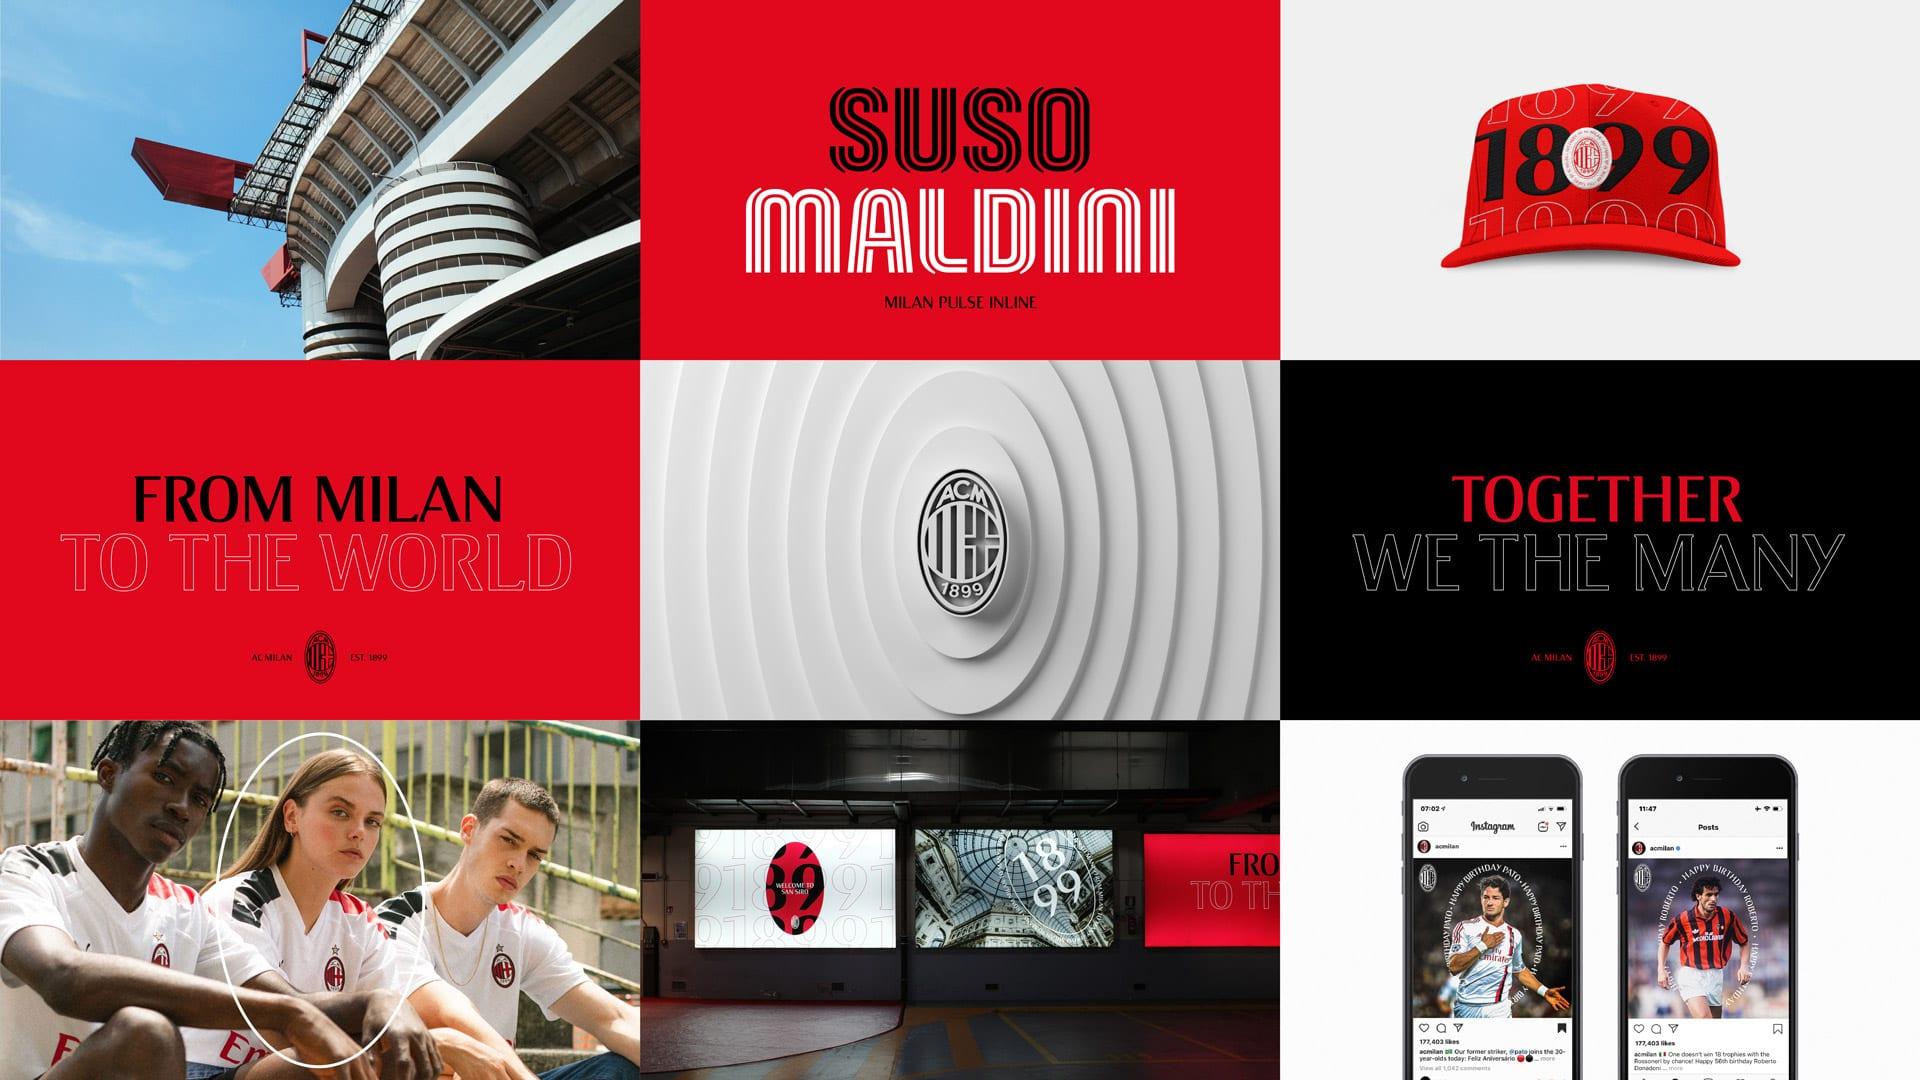 ac milan s novym logom aj custom fontom acbody 1 - AC Milan s novým logom aj custom fontom